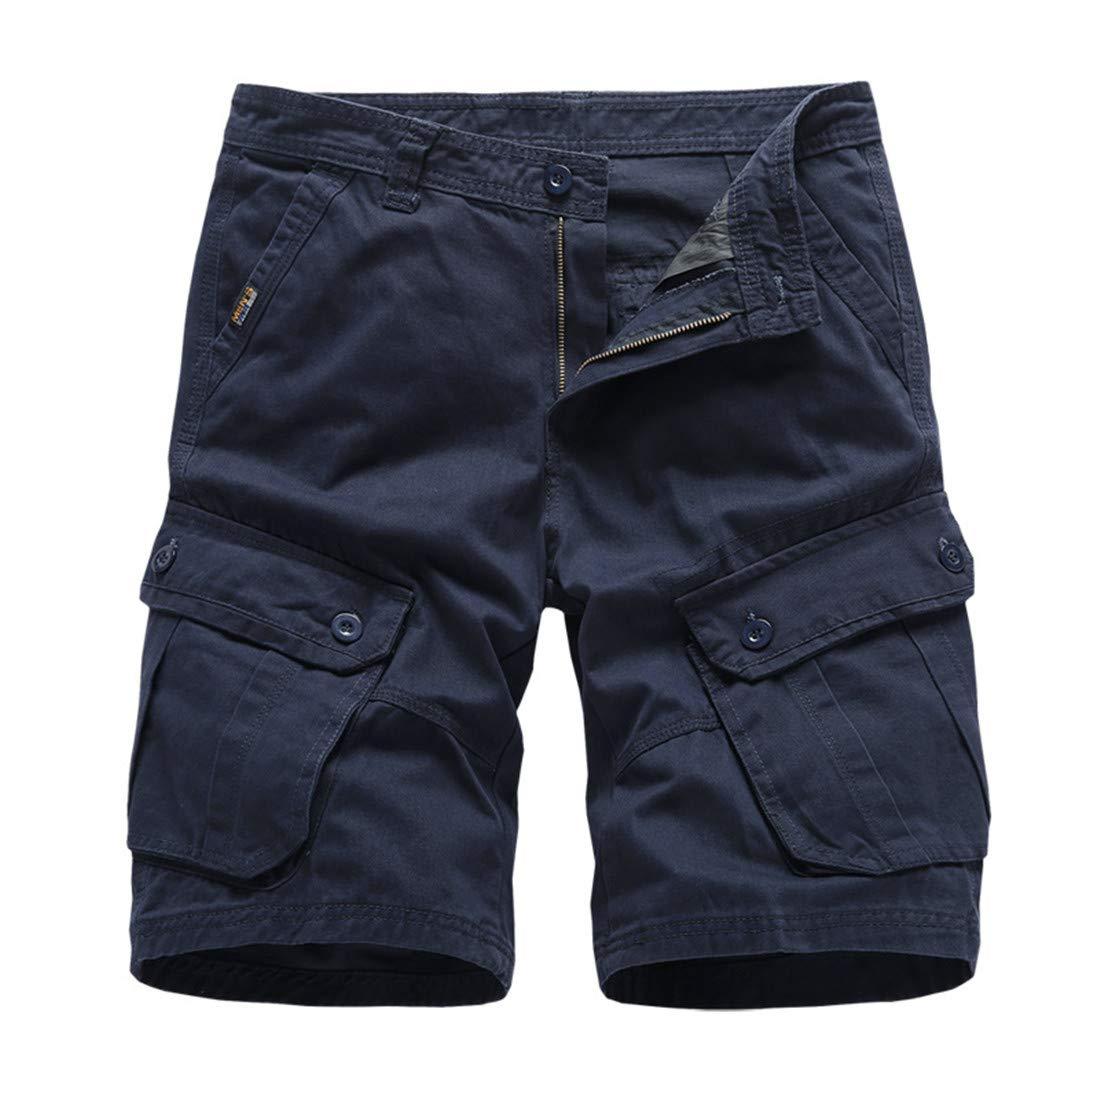 Aeneontrue Mens Cargo Shorts Cotton Multi-Pocket Outdoor Casual Short Pants 30-38